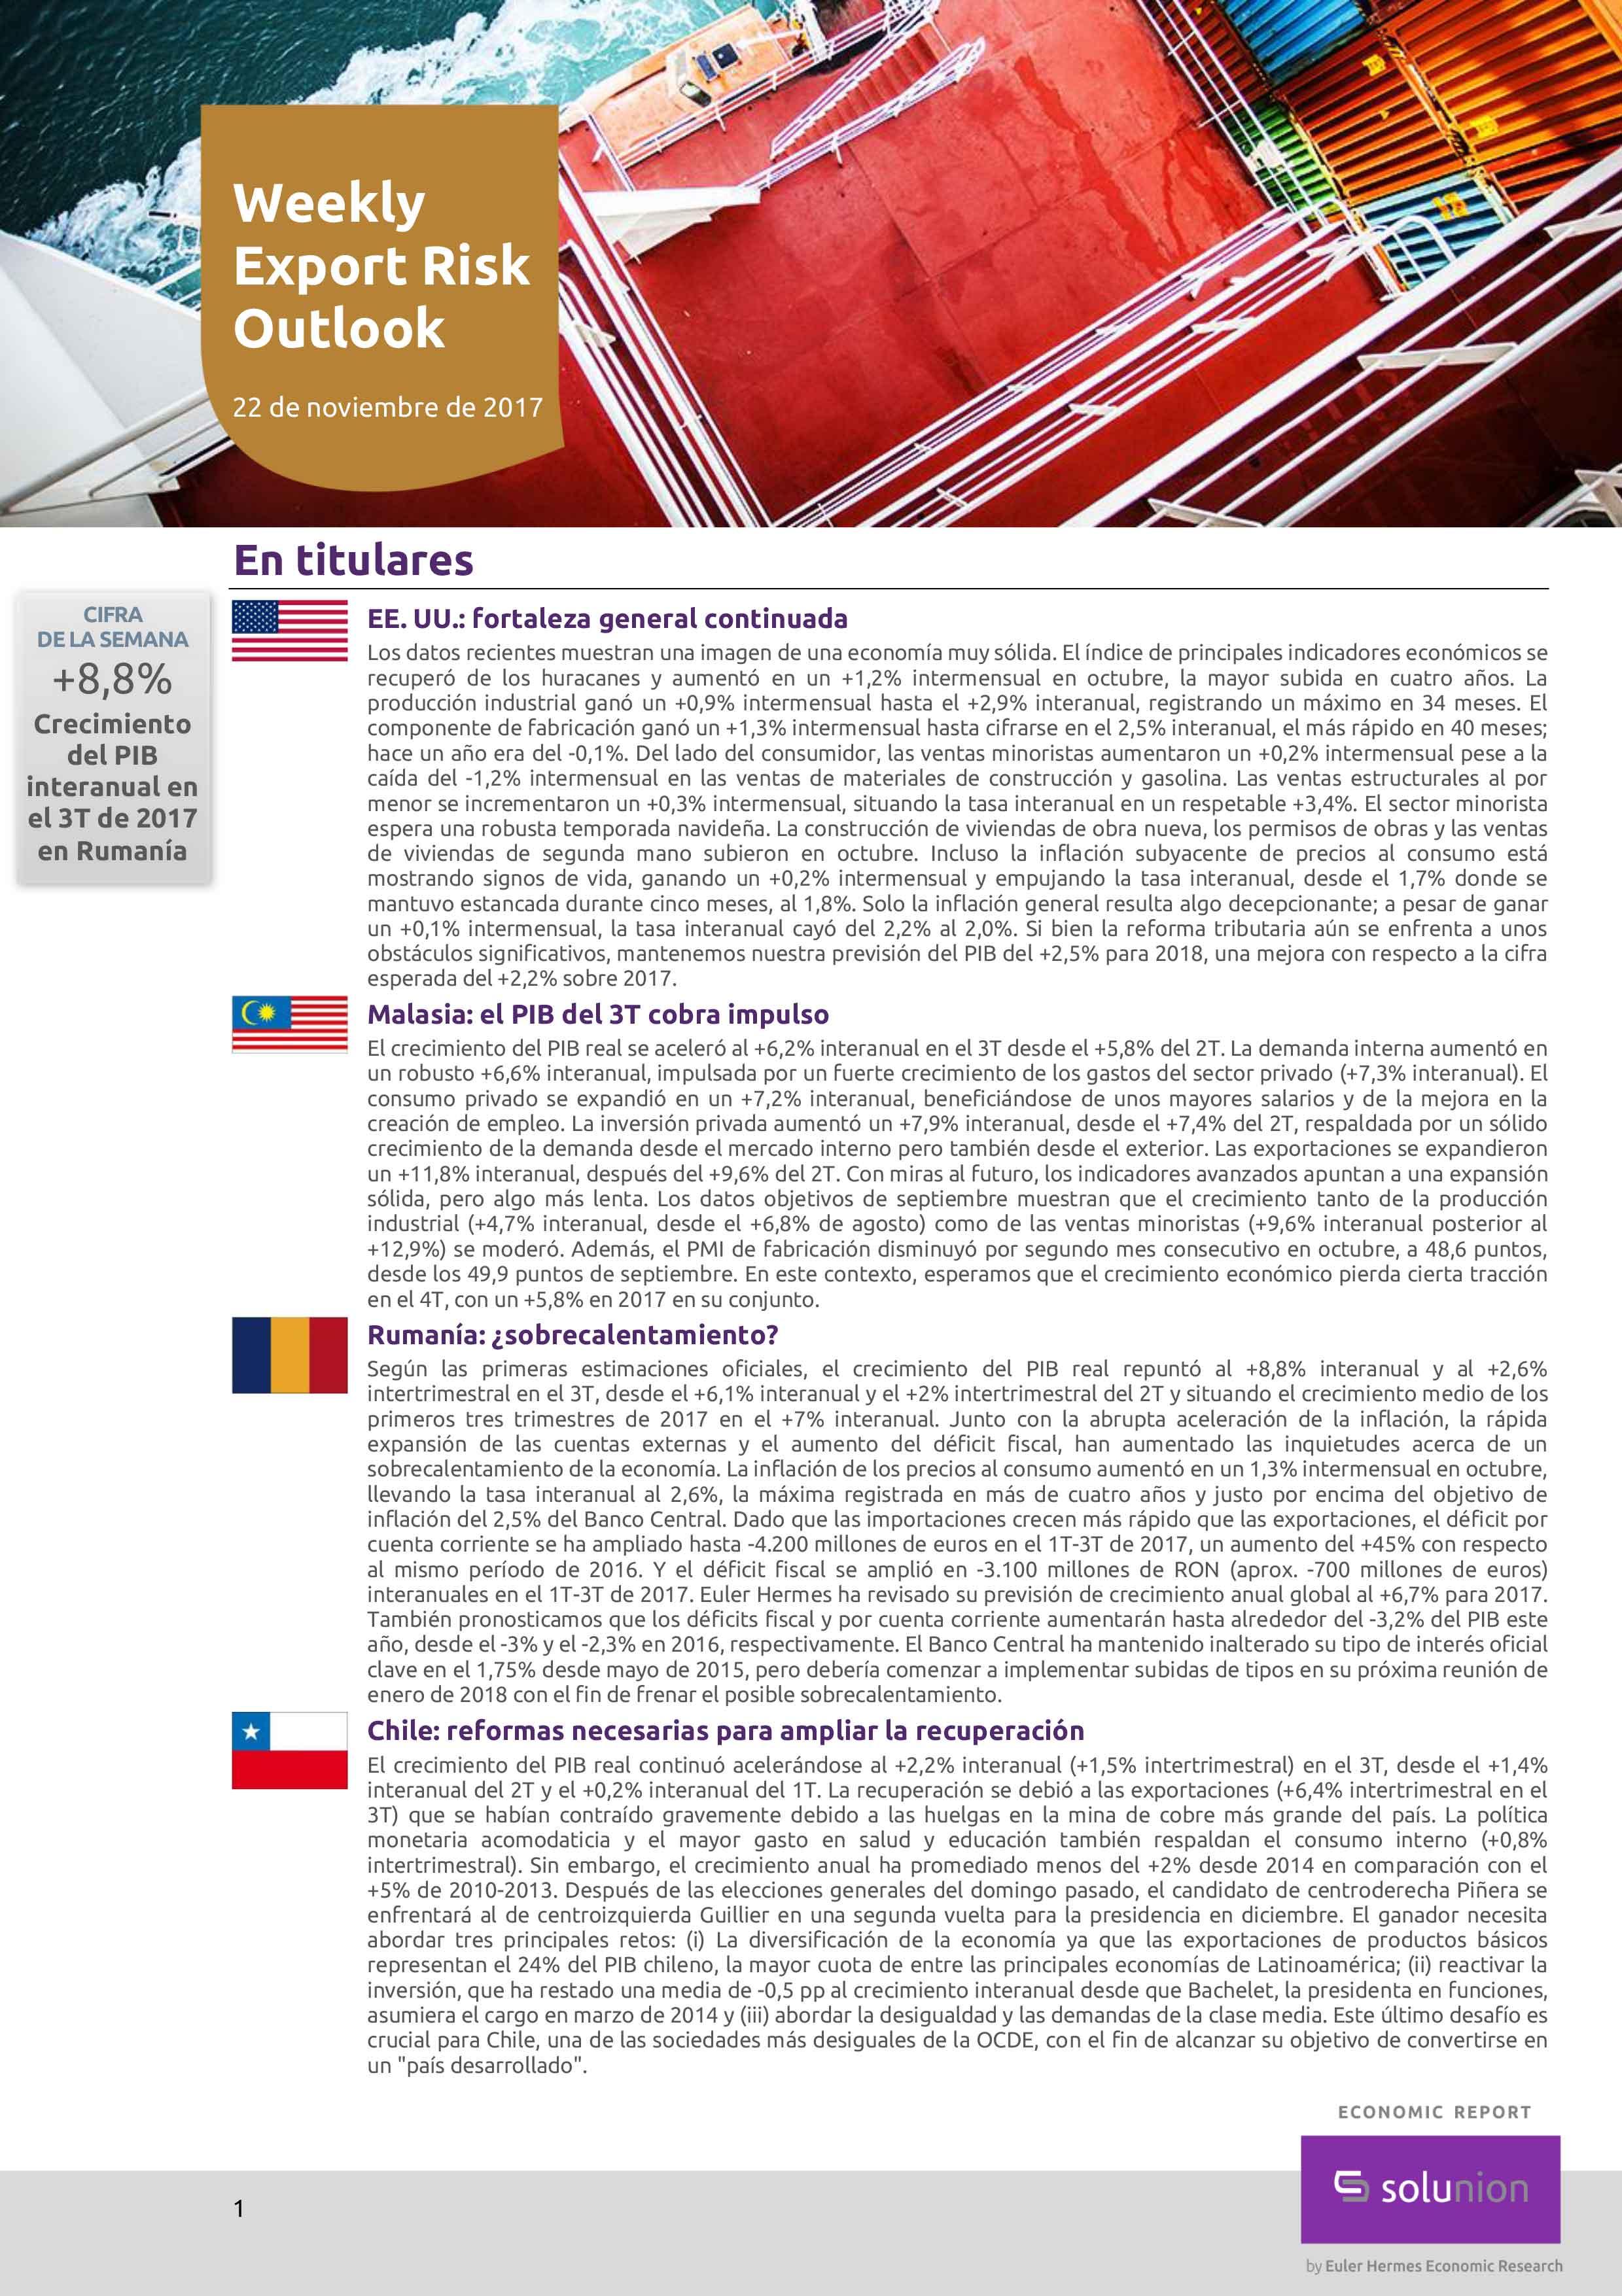 Weekly Export Risk Outlook – 22 de noviembre de 2017